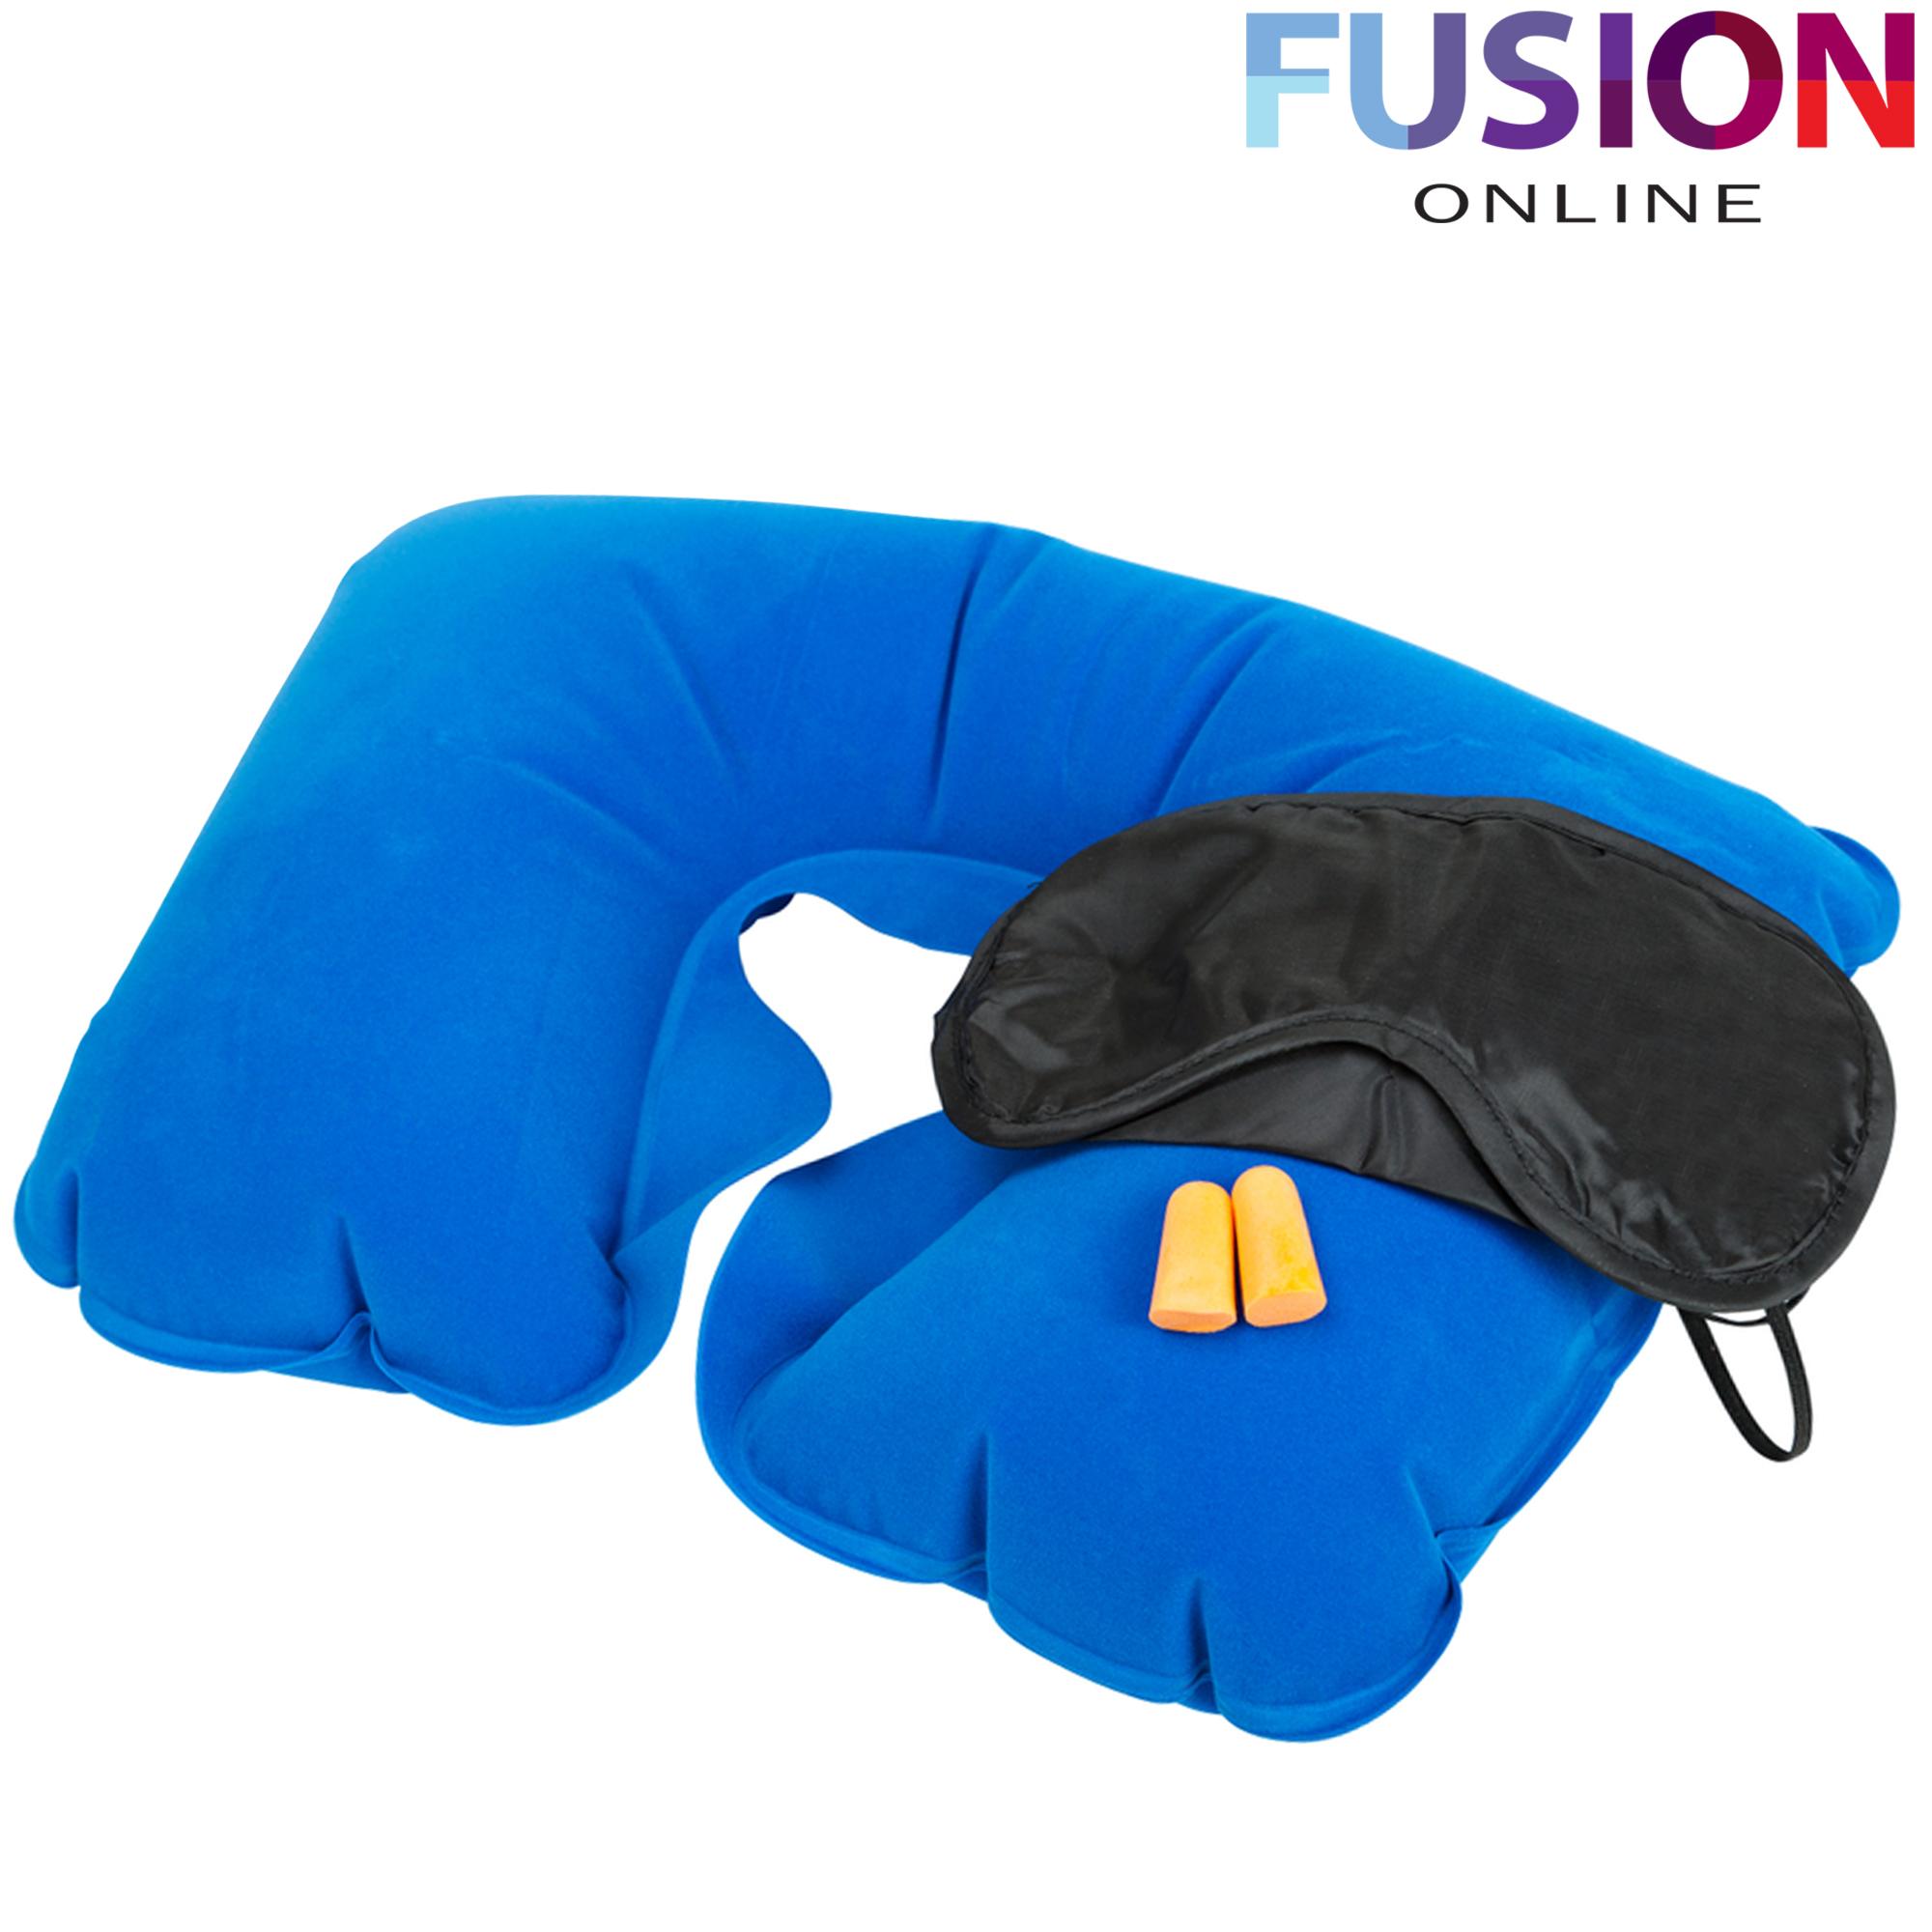 Inflatable Travel Pillow Neck Rest Cushion Sleep Sleeping